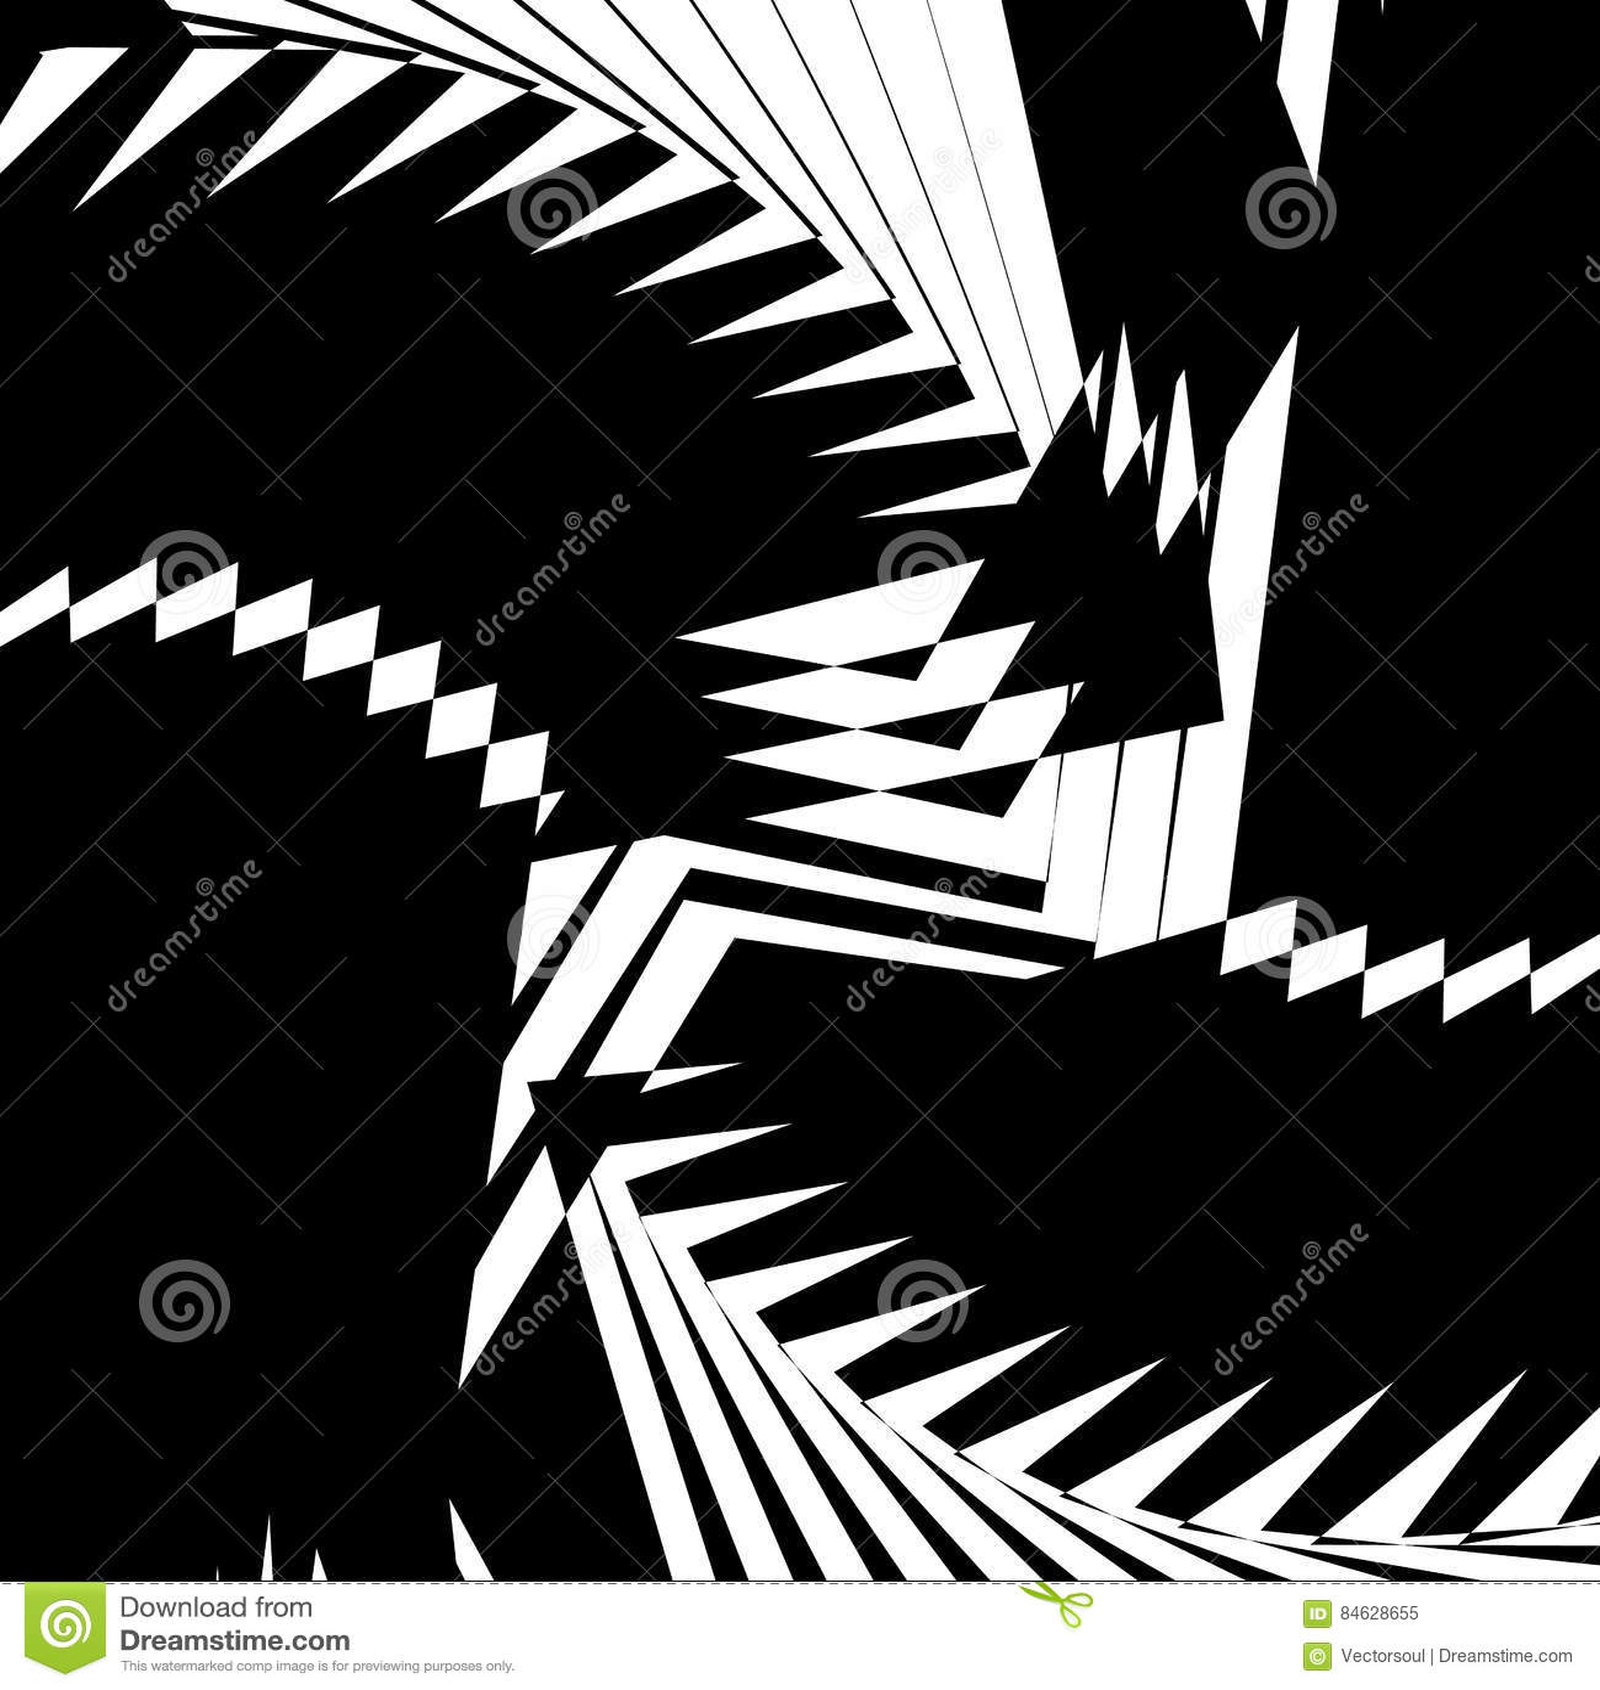 Monochrome texture, monochrome pattern with random shapes lines